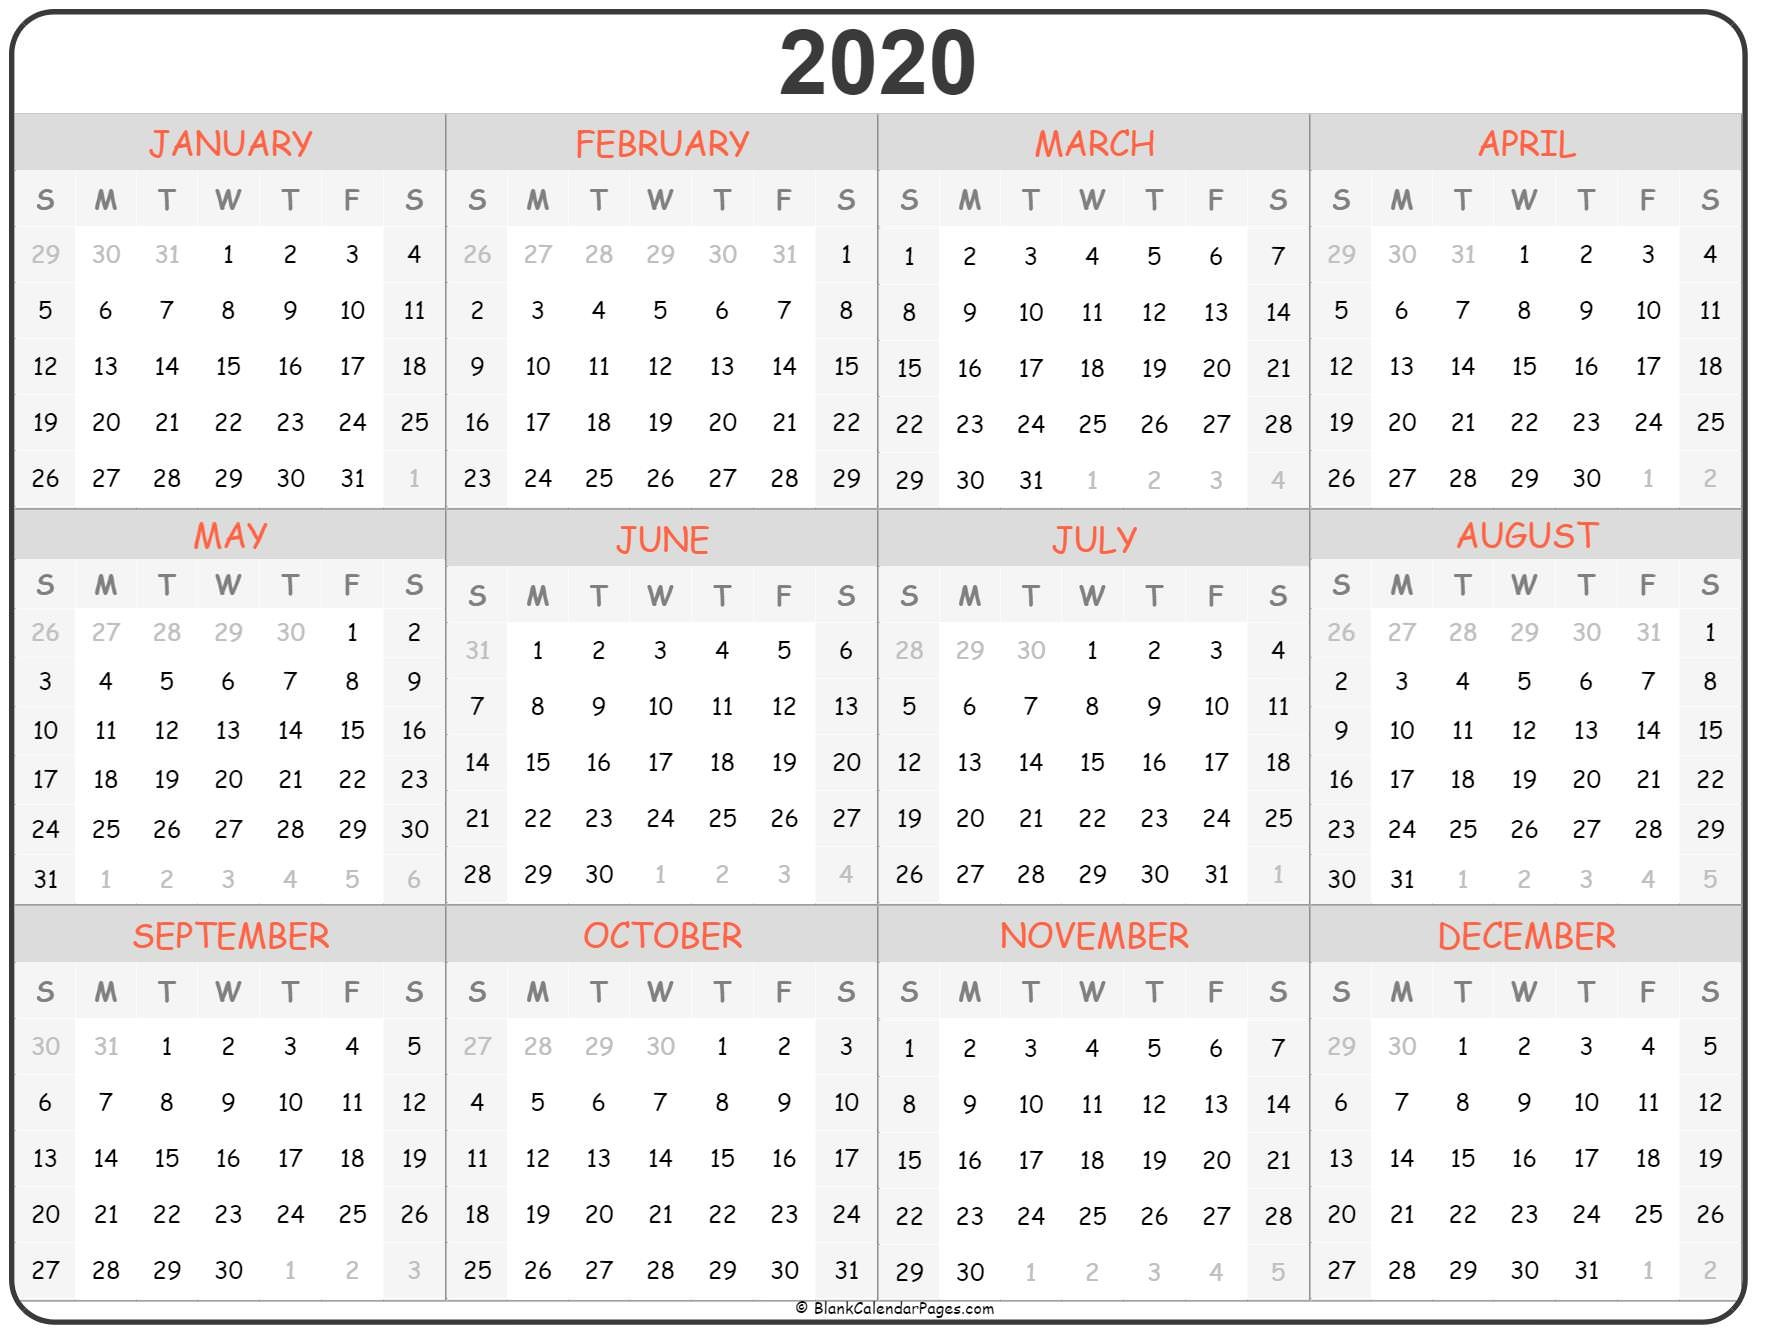 Calendar for 2020 Printable 2020 Year Calendar